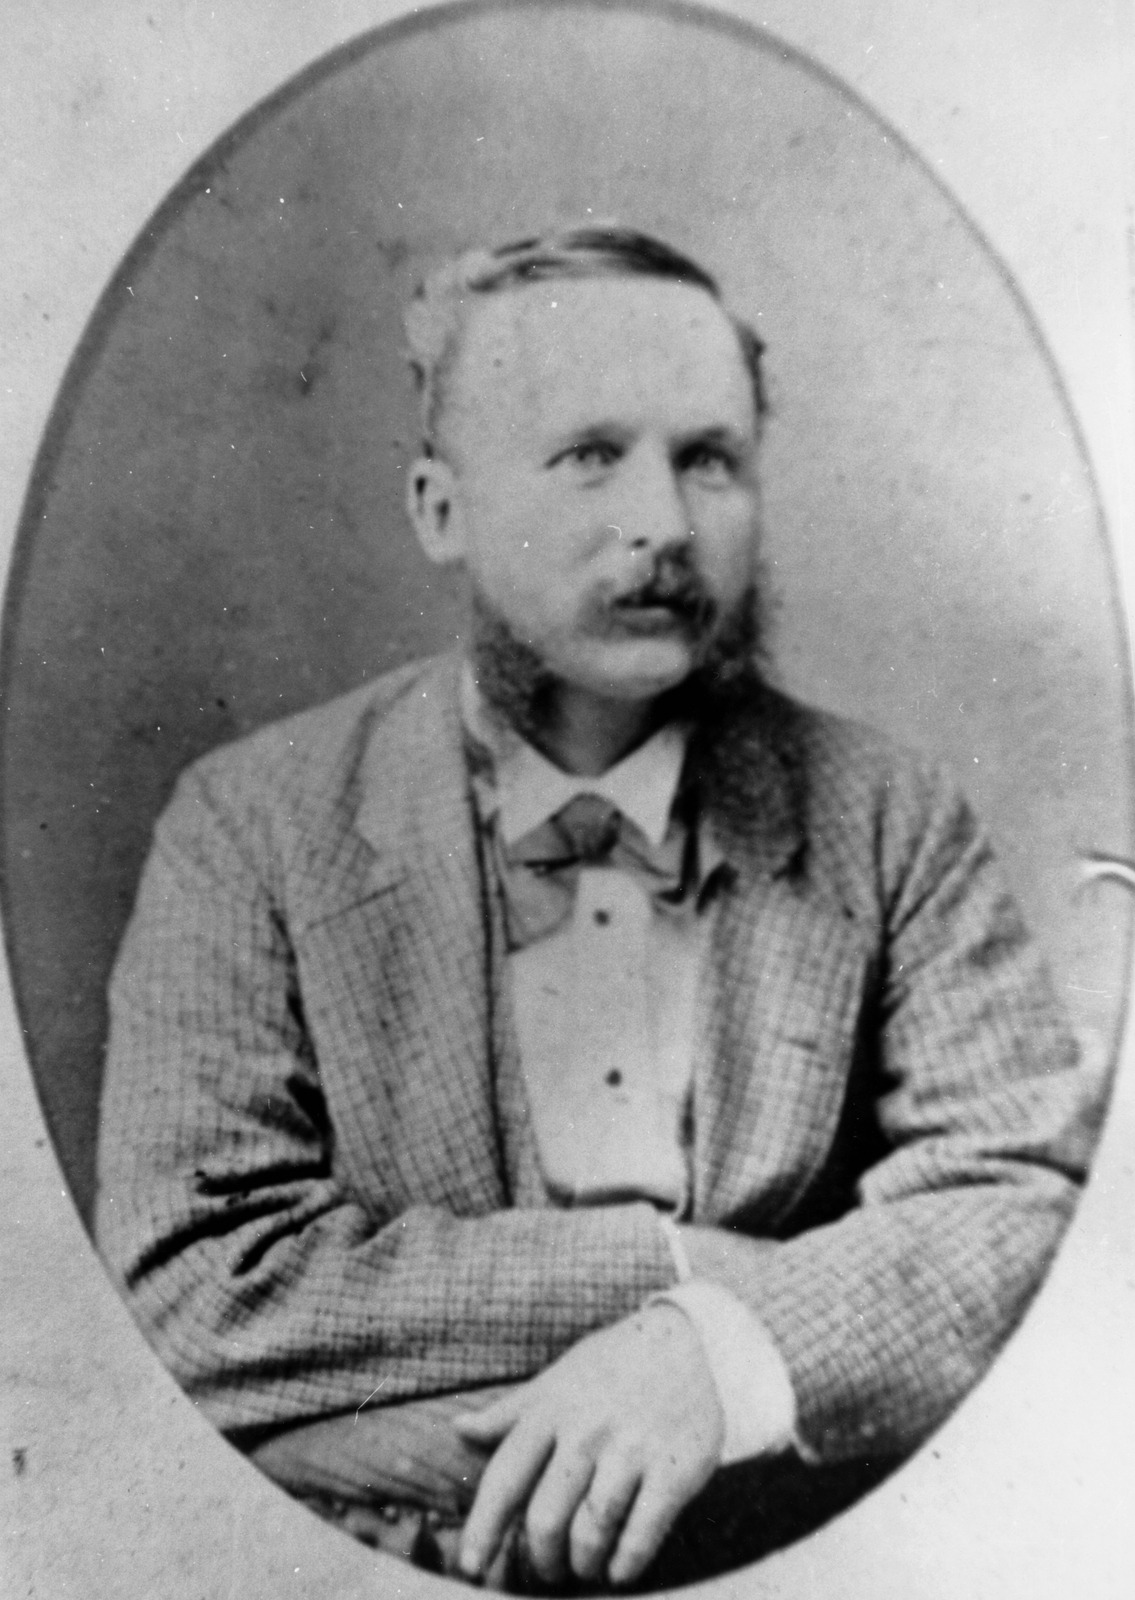 William Knox D'Arcy, Rockhampton